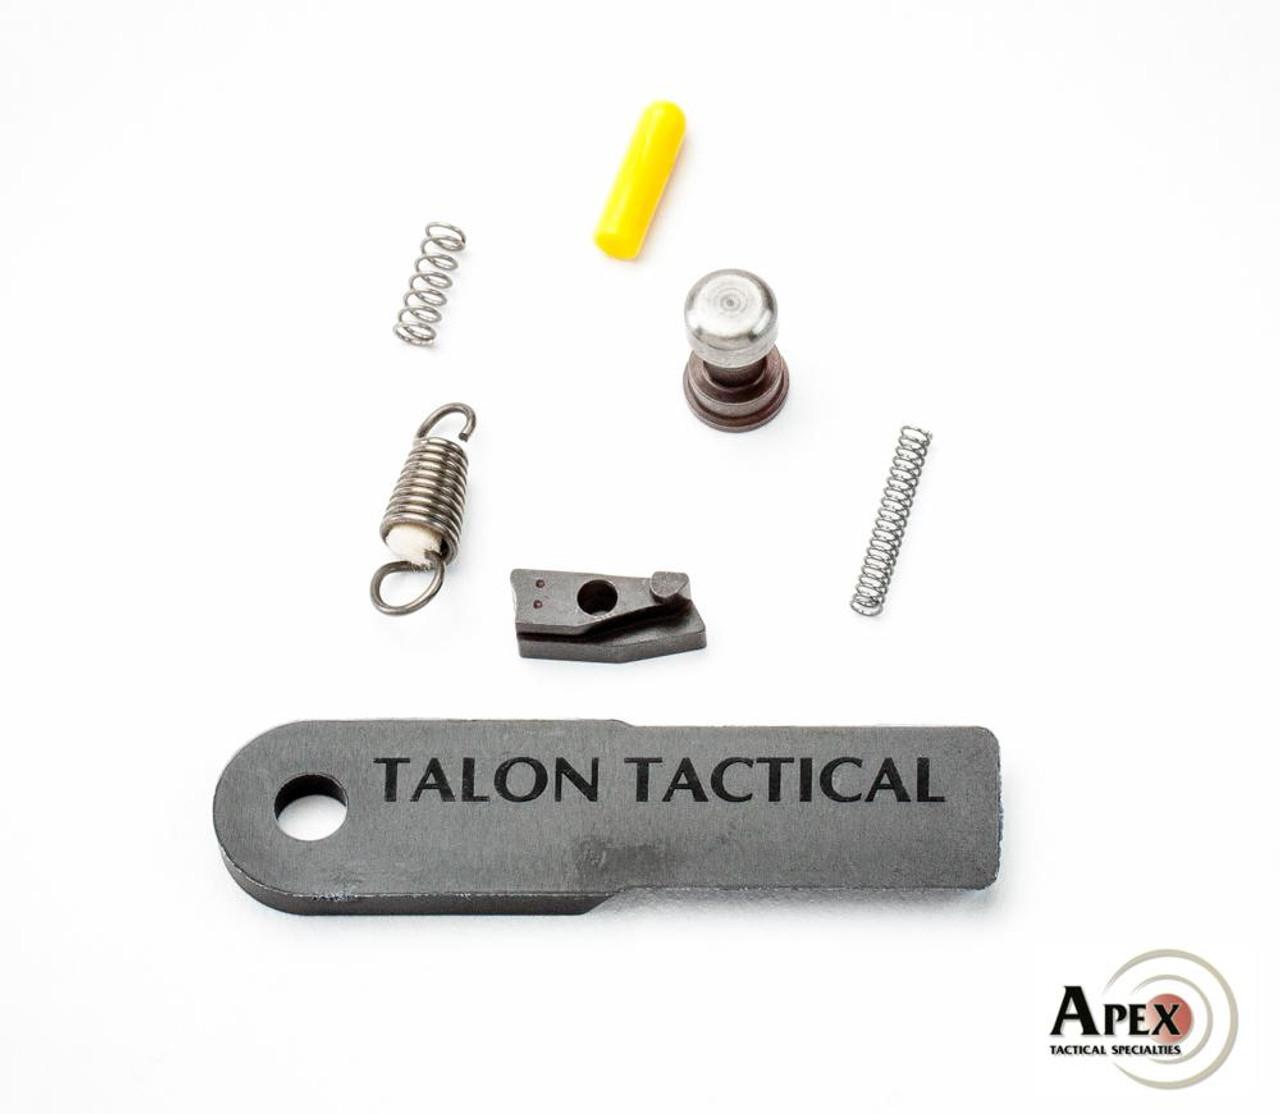 Apex Tactical Action Enhancement Aluminum Trigger & Duty/Carry Kit for M&P M2.0 (and M&P 45)